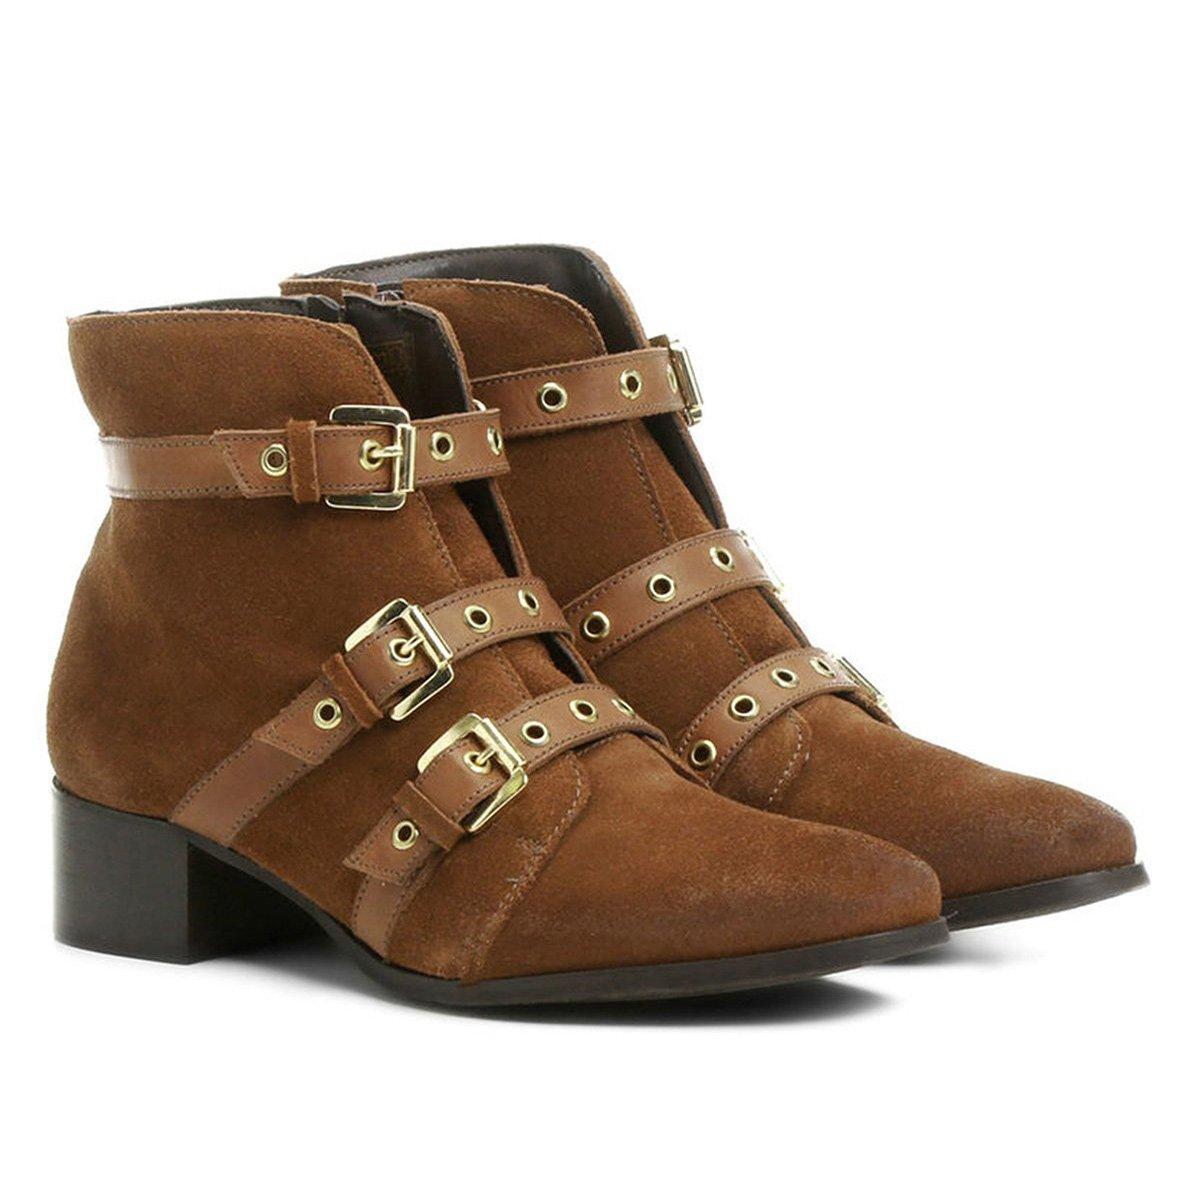 535729cd0 Bota Couro Cano Curto Shoestock Ilhós Feminina